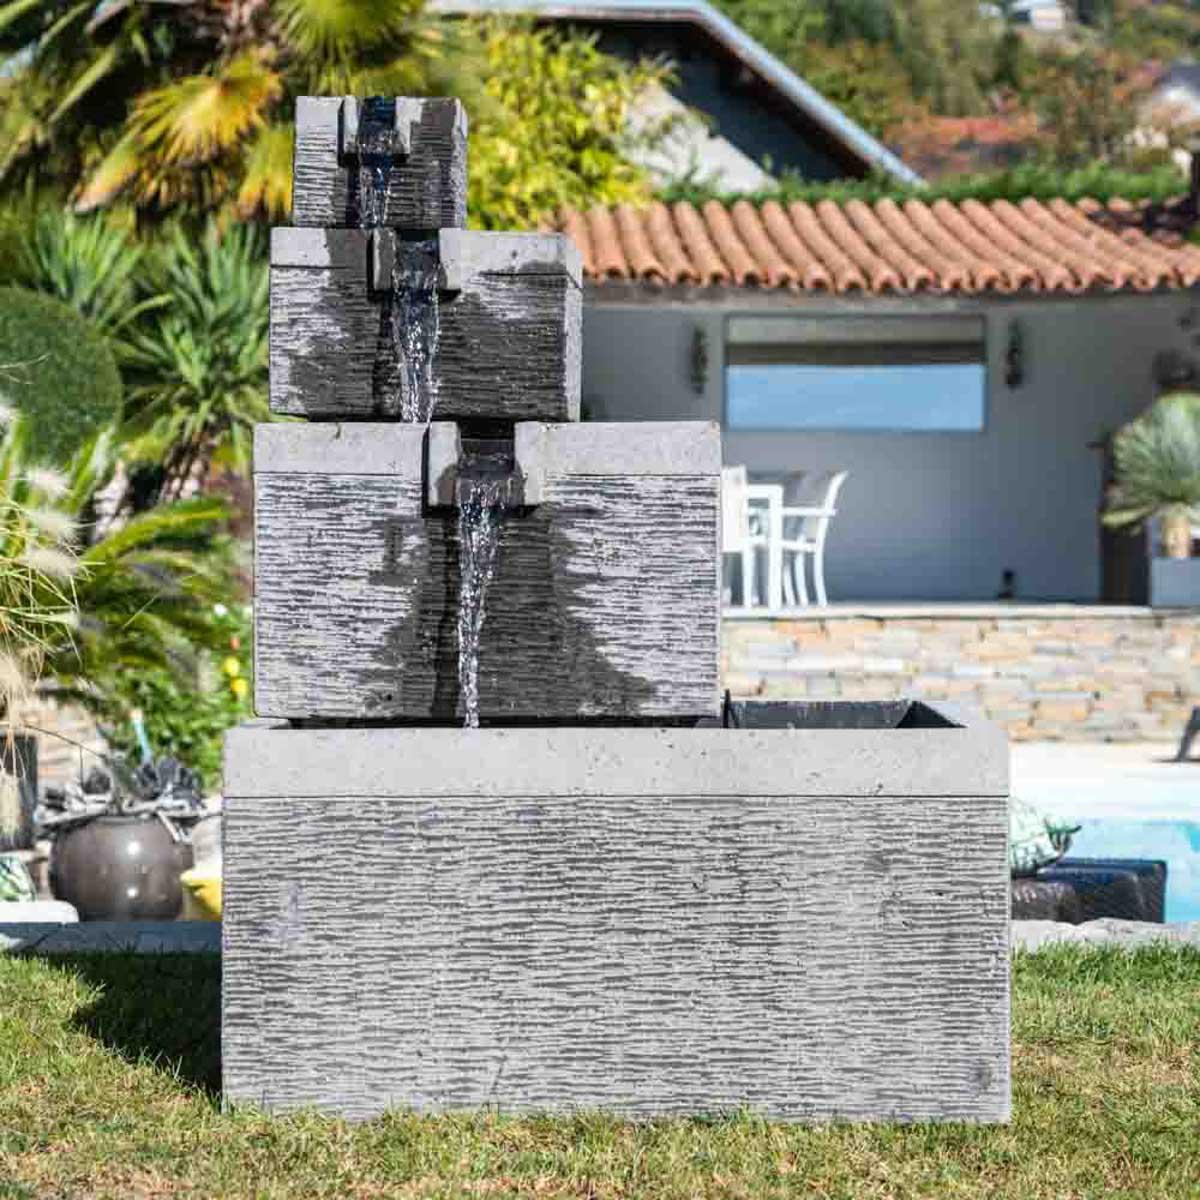 Bassin De Jardin Design Zen fontaine de jardin bassin carré 4 coupes noir gris